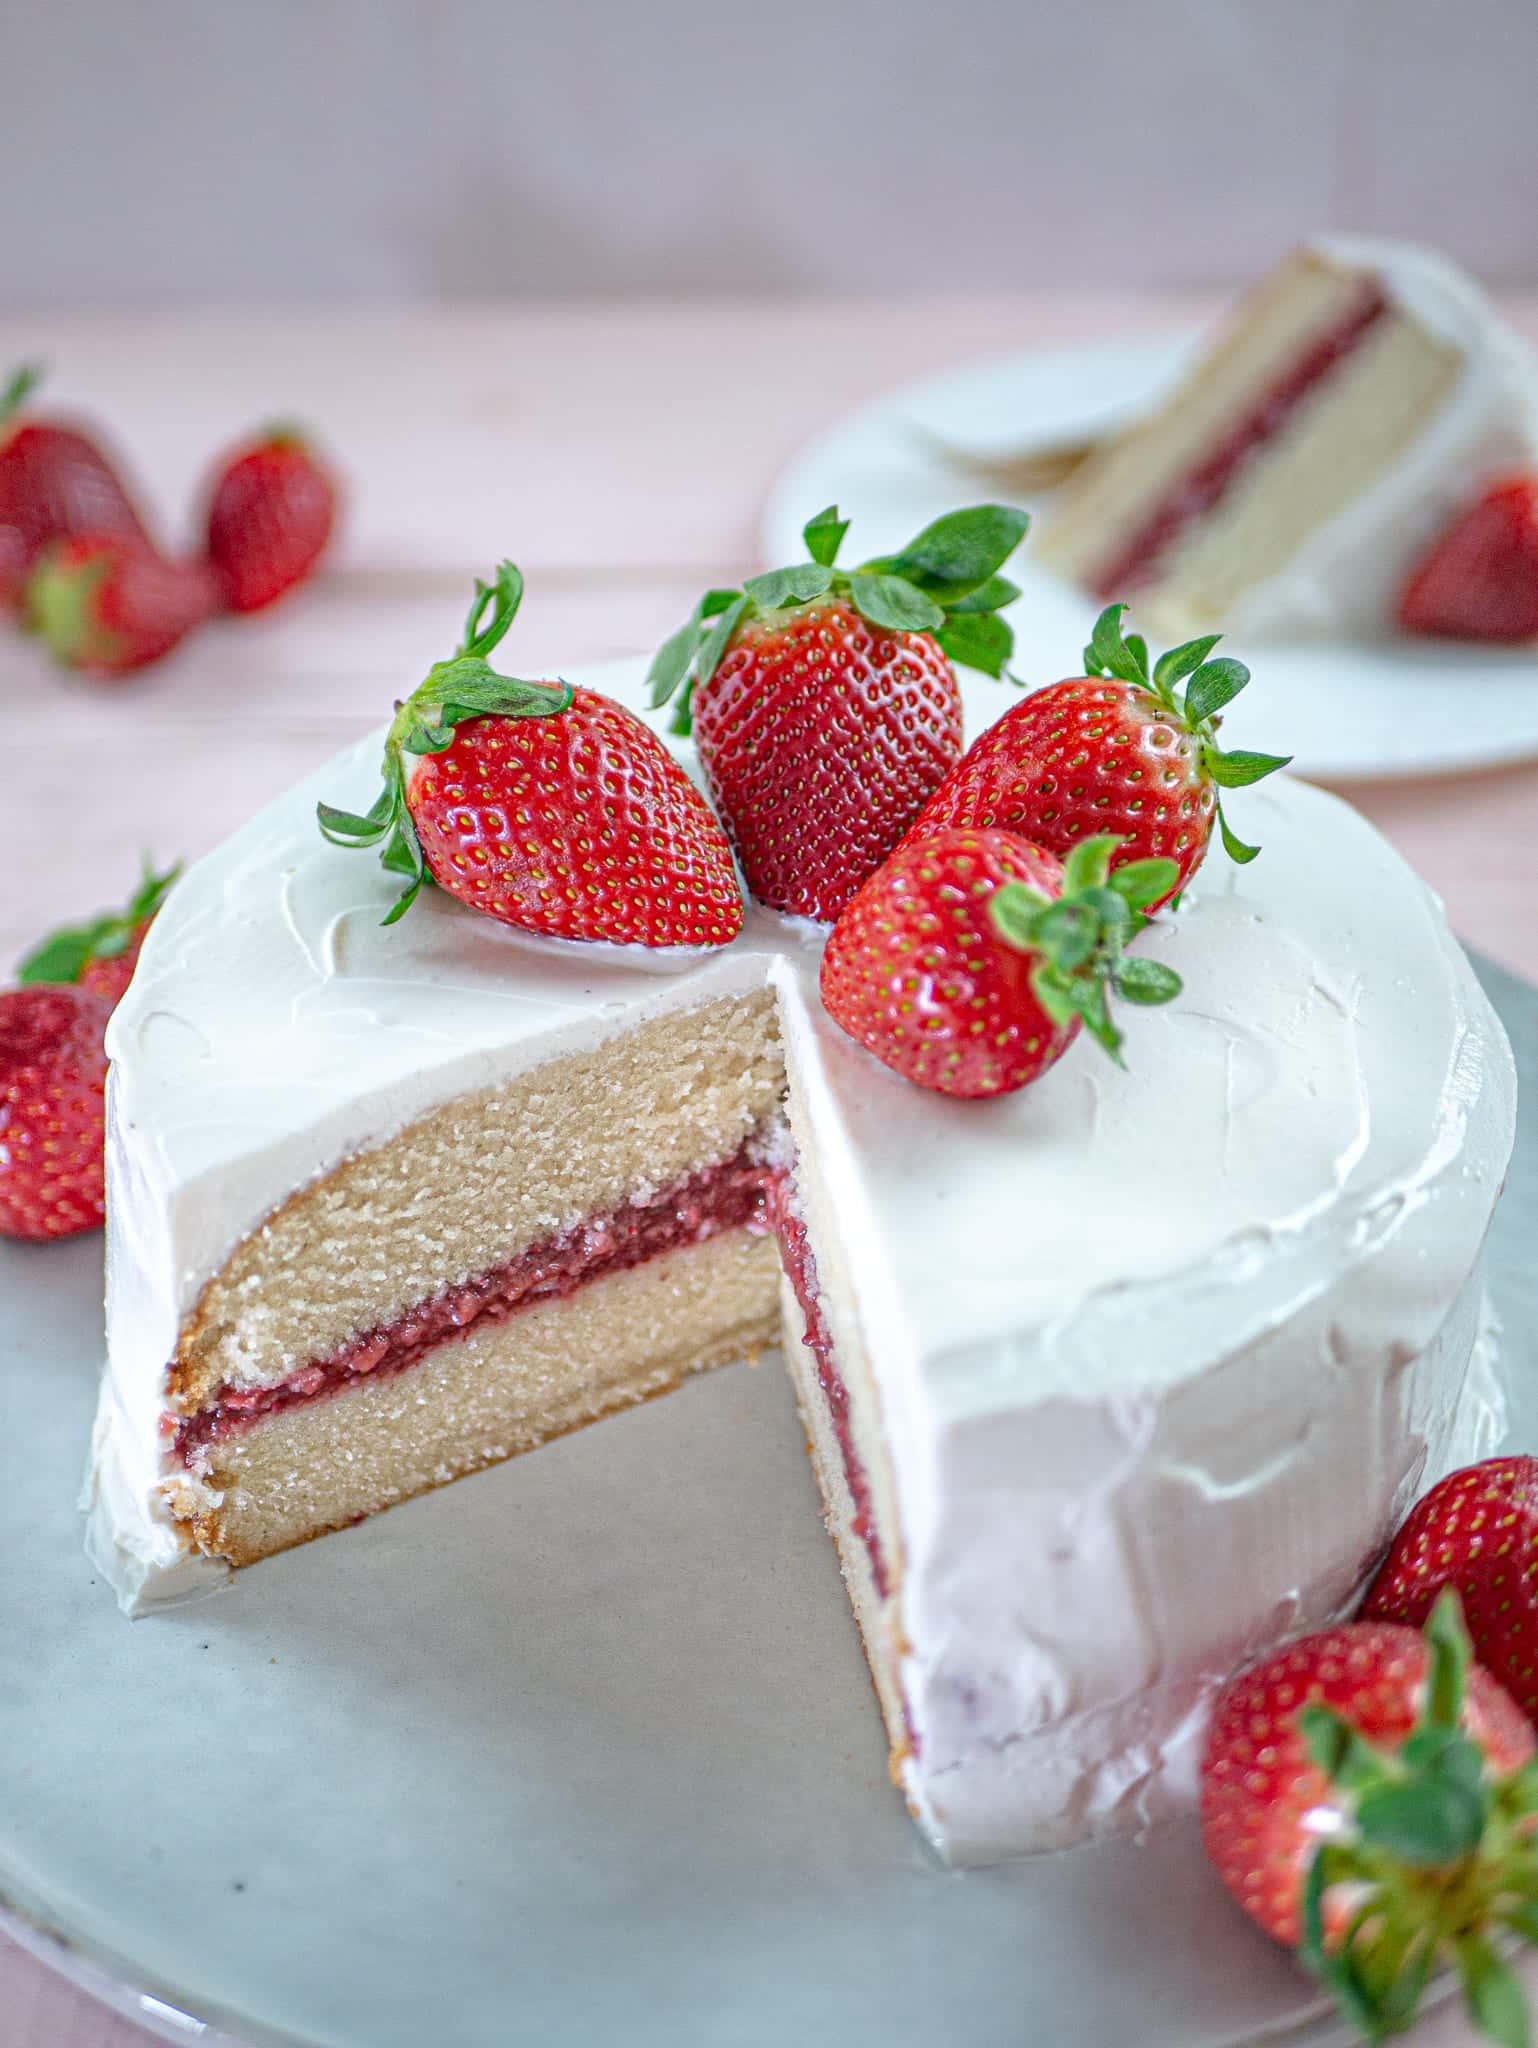 CUT OPEN VANILLA CAKE WITH STRAWBERRY JAM